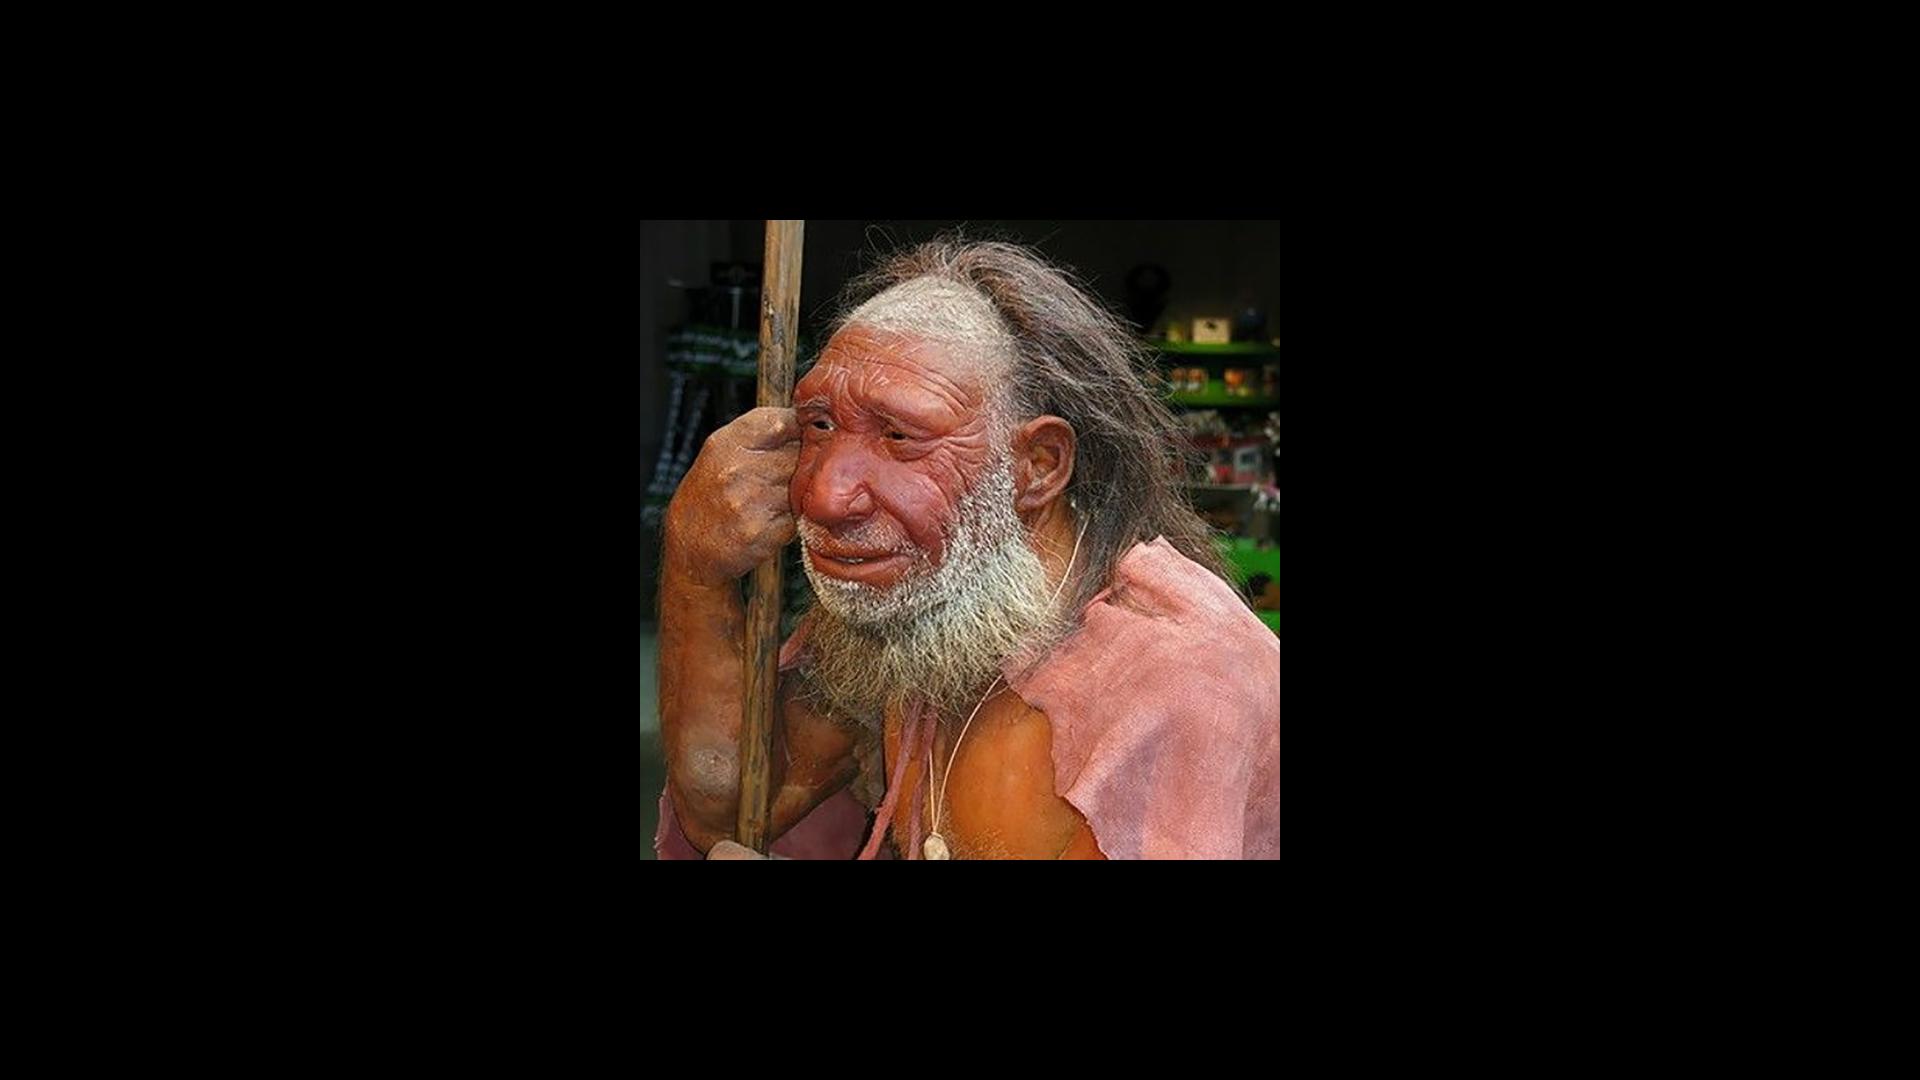 clifton-beef-neandertal-neanderthal-cover-art-basement-made-mad-tape-album-mixtape-basement-made-art-song